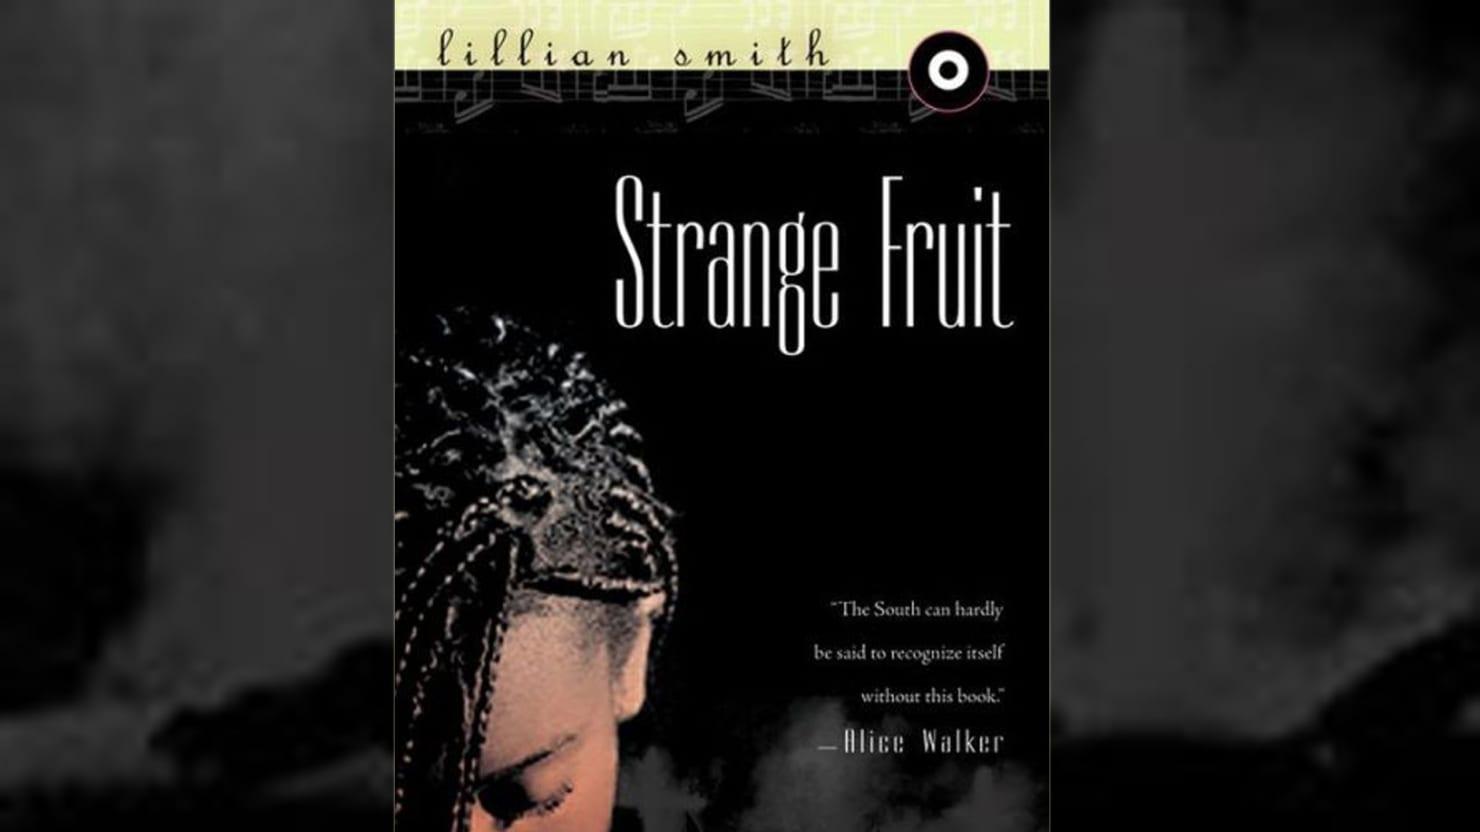 Lillian Smith's Bombshell Novel About Interracial Love